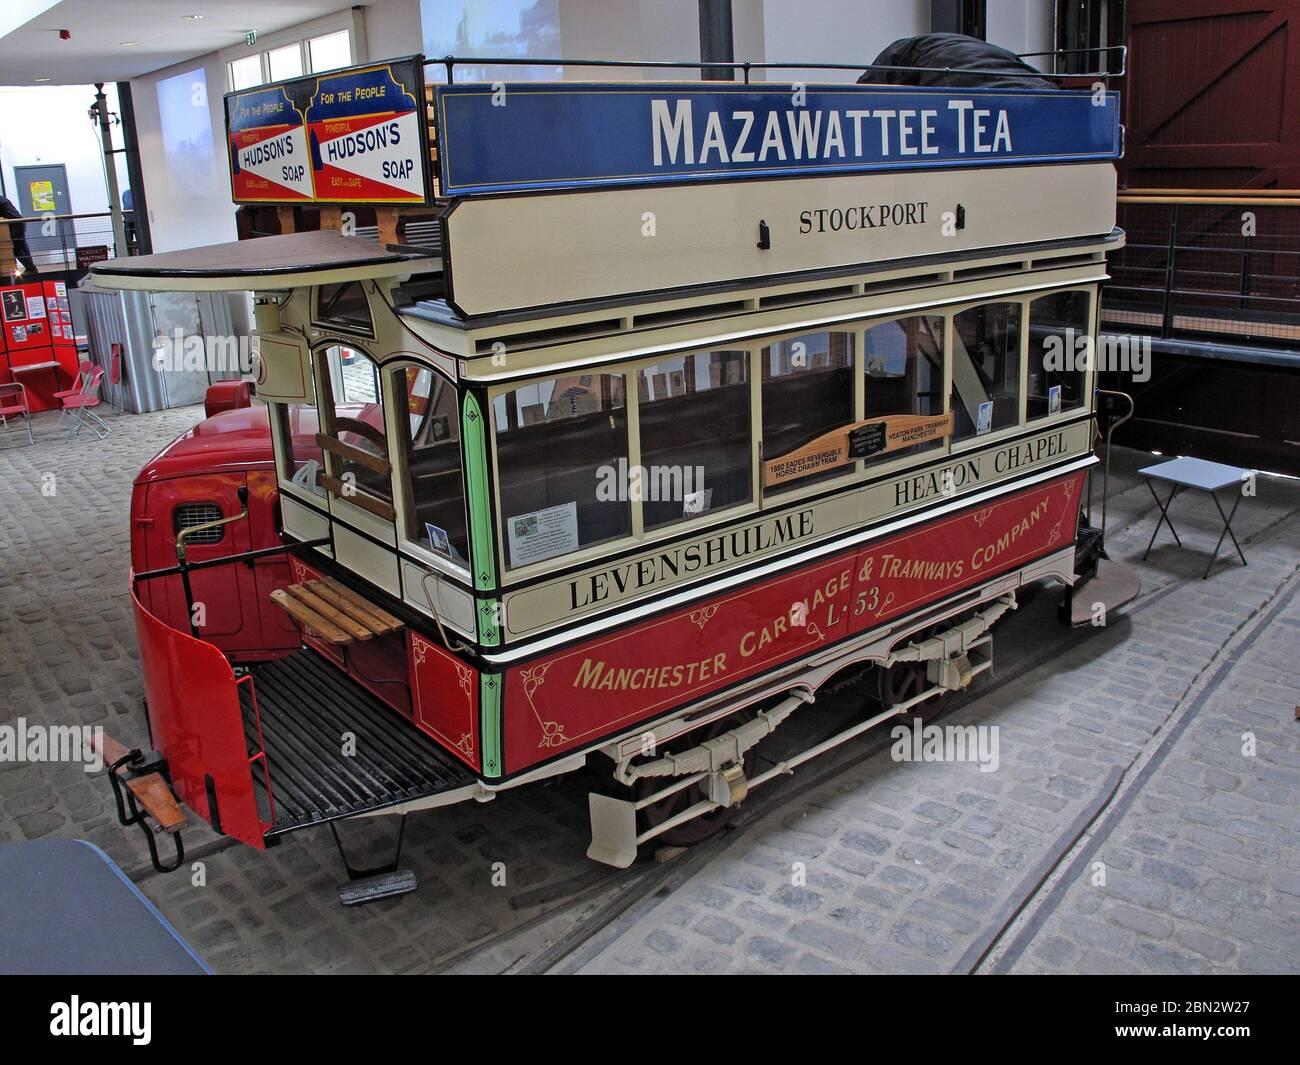 GoTonySmith,Hotpixuk,@Hotpixuk,trams,Heaton Chapel,Stockport,192,192 bus,192 tram,Mazawattee tea advert,Stockport trams,Stockport tramways,tramway,Manchester,Greater Manchester,vehicle,double,deck,decker,museum